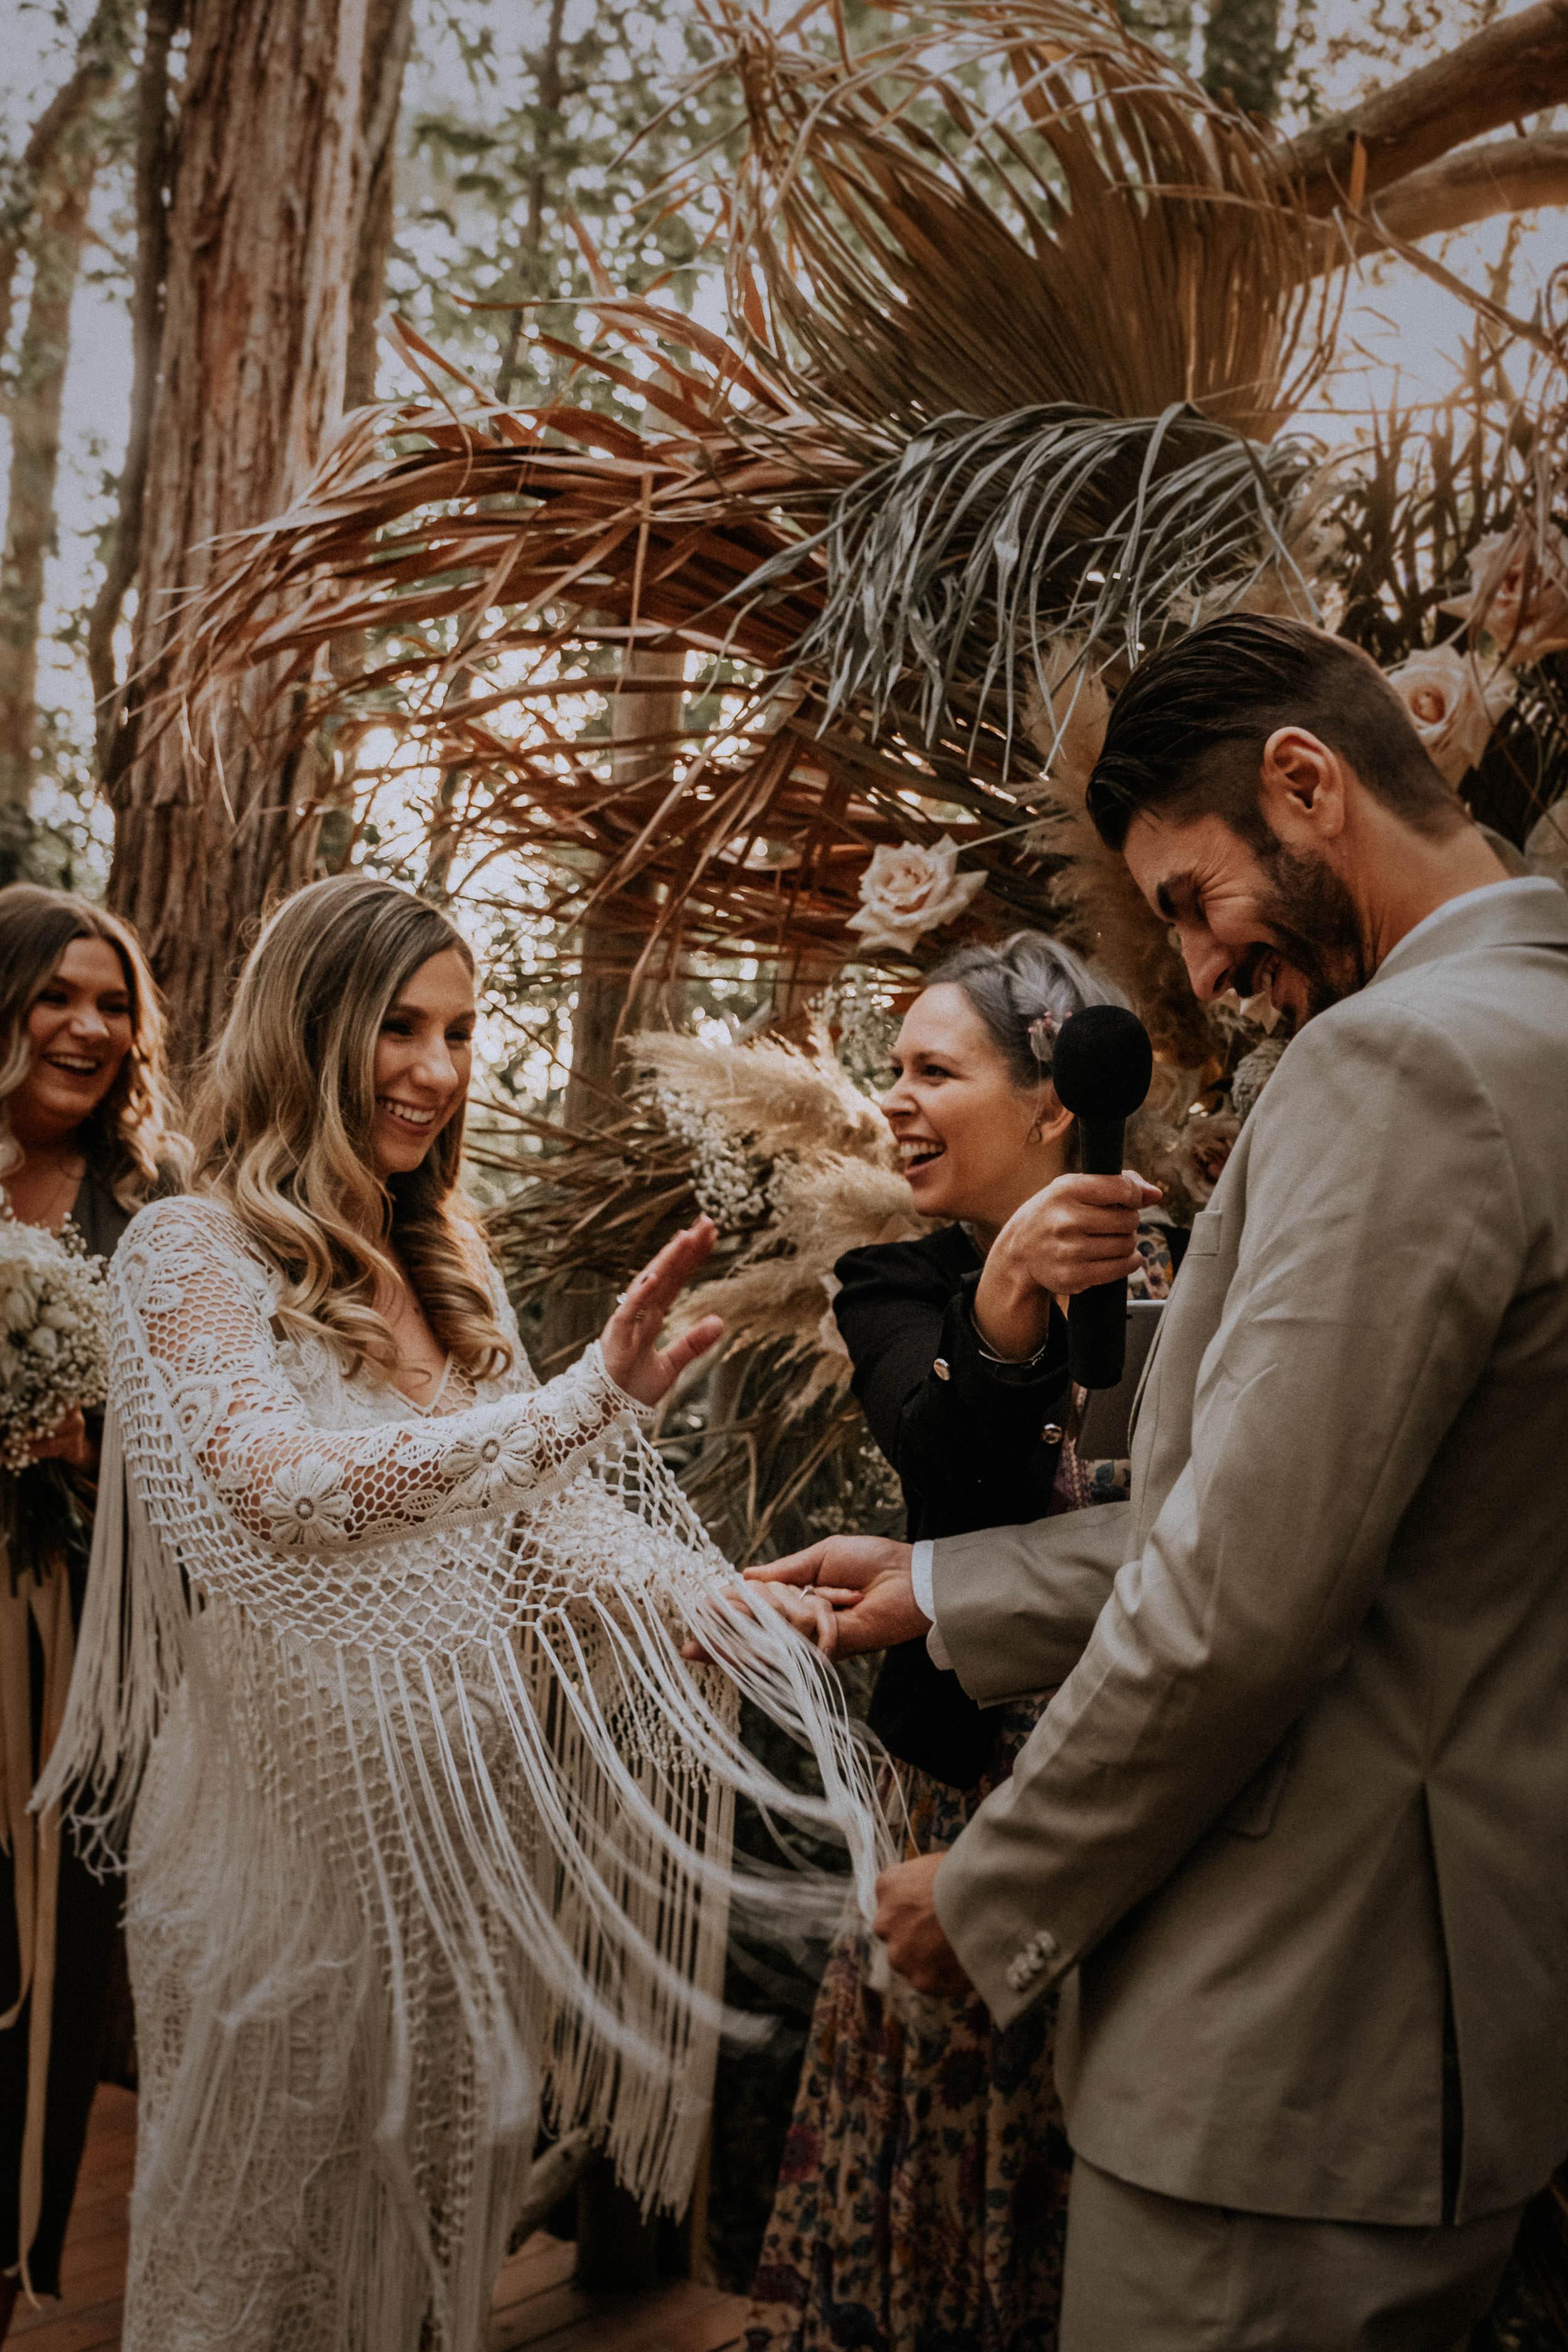 S&A Elopement - Kings & Thieves - Shred 'Til Dead - Central Coast Beach Forest Wedding - 216.jpg